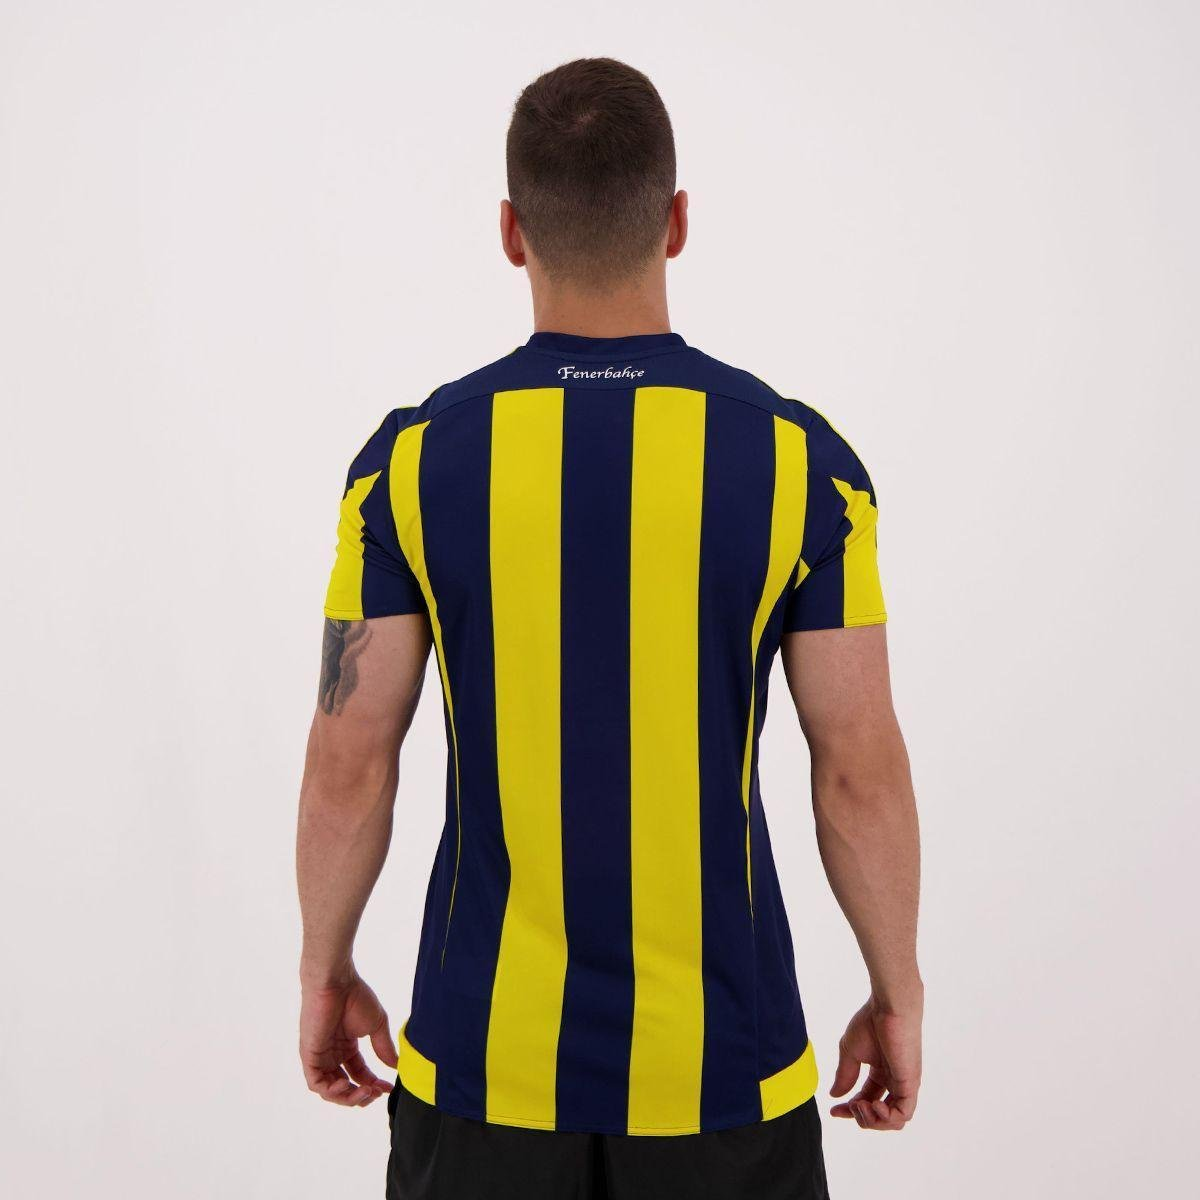 Camisa Adidas Fenerbahce Home 2016 Netshoes